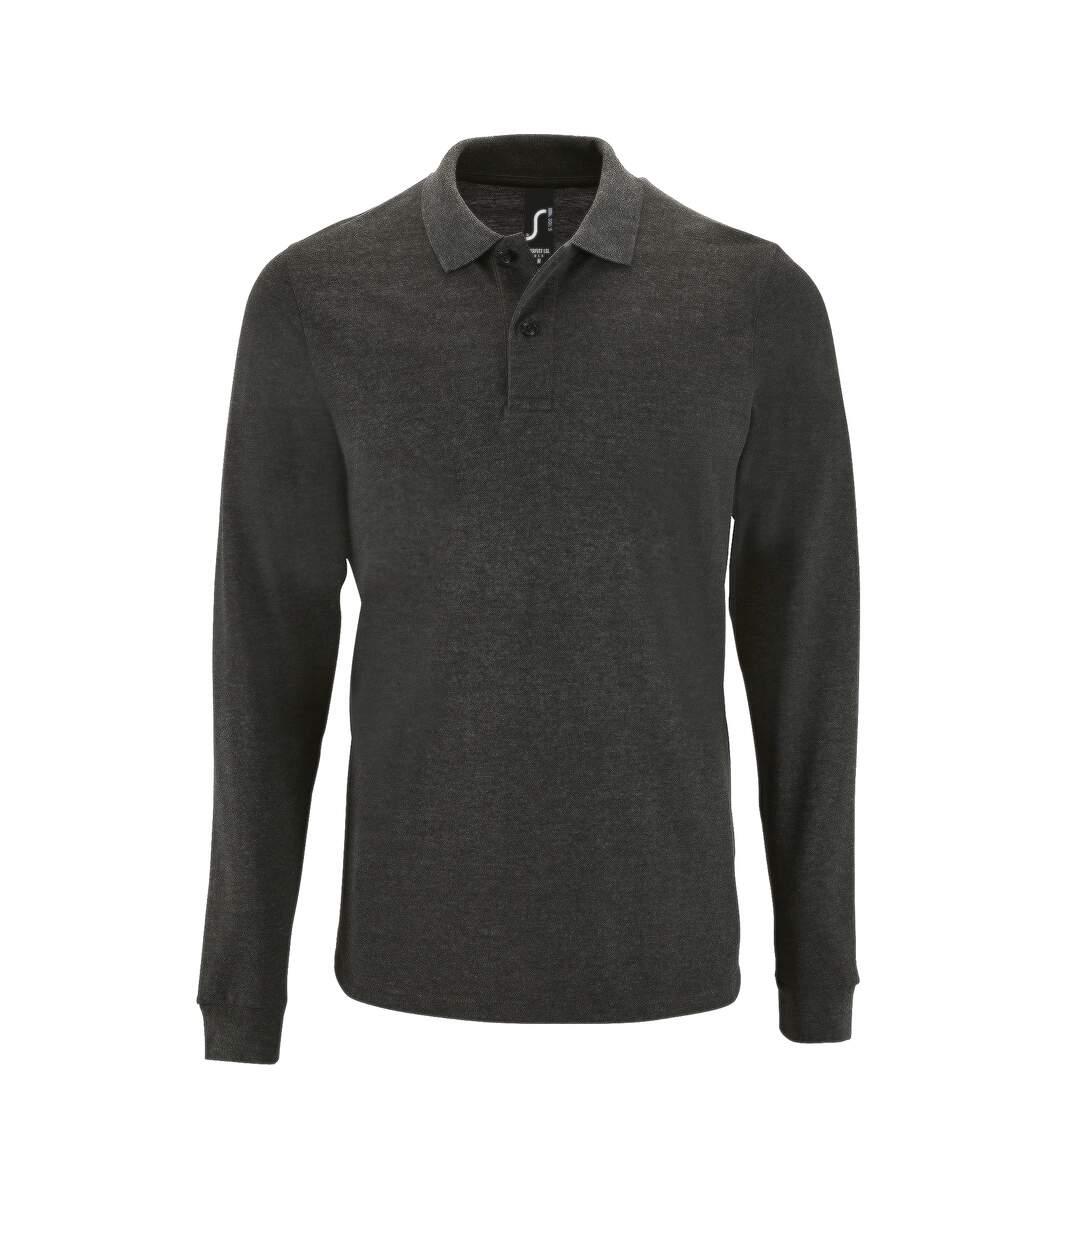 SOLS Mens Perfect Long Sleeve Pique Polo Shirt (Charcoal Marl) - UTPC2912